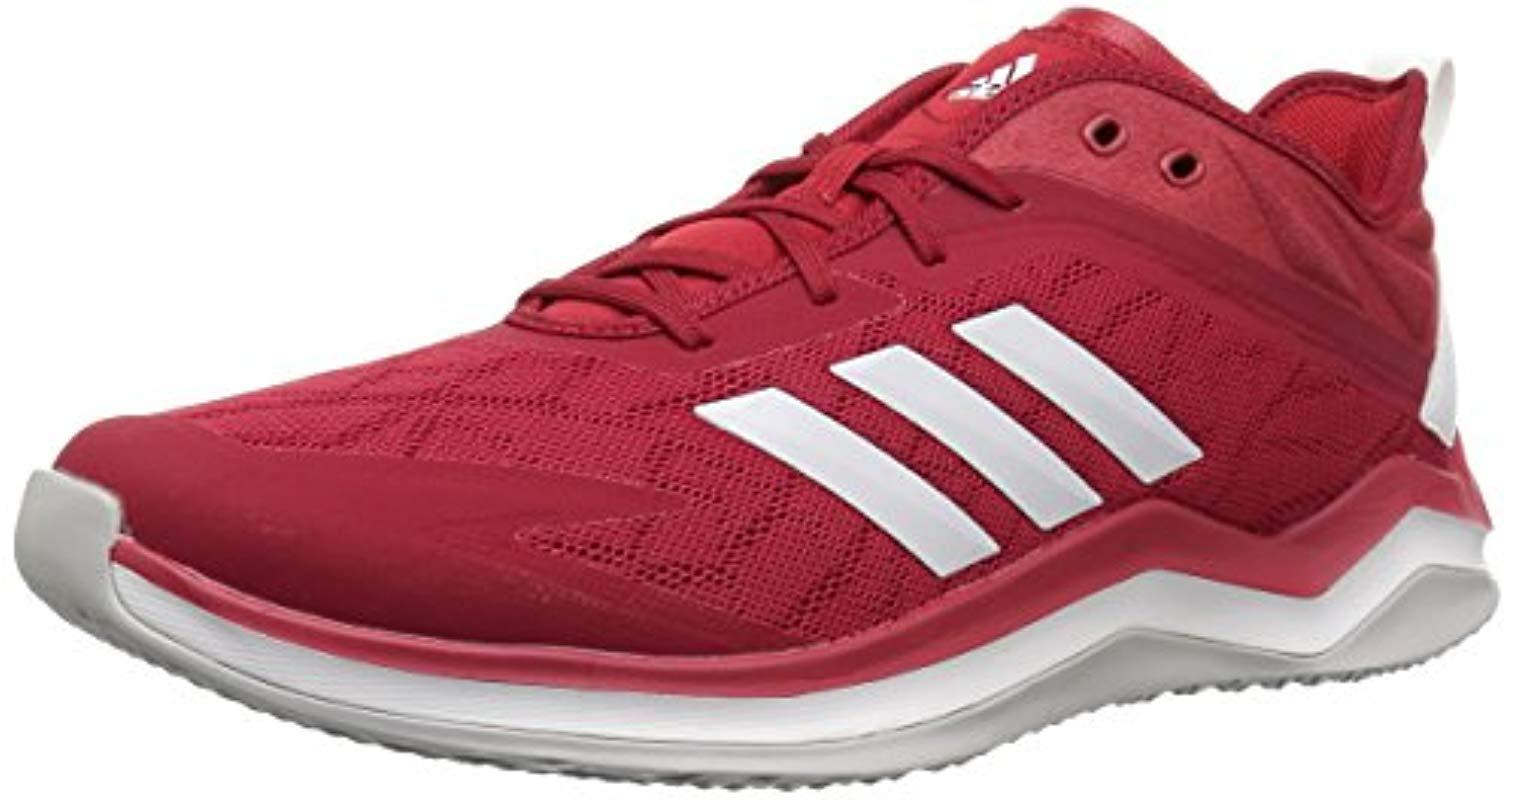 wholesale dealer 20224 6cd28 adidas. Men s Speed Trainer 4 Baseball Shoe, Power Red crystal White scarlet  ...